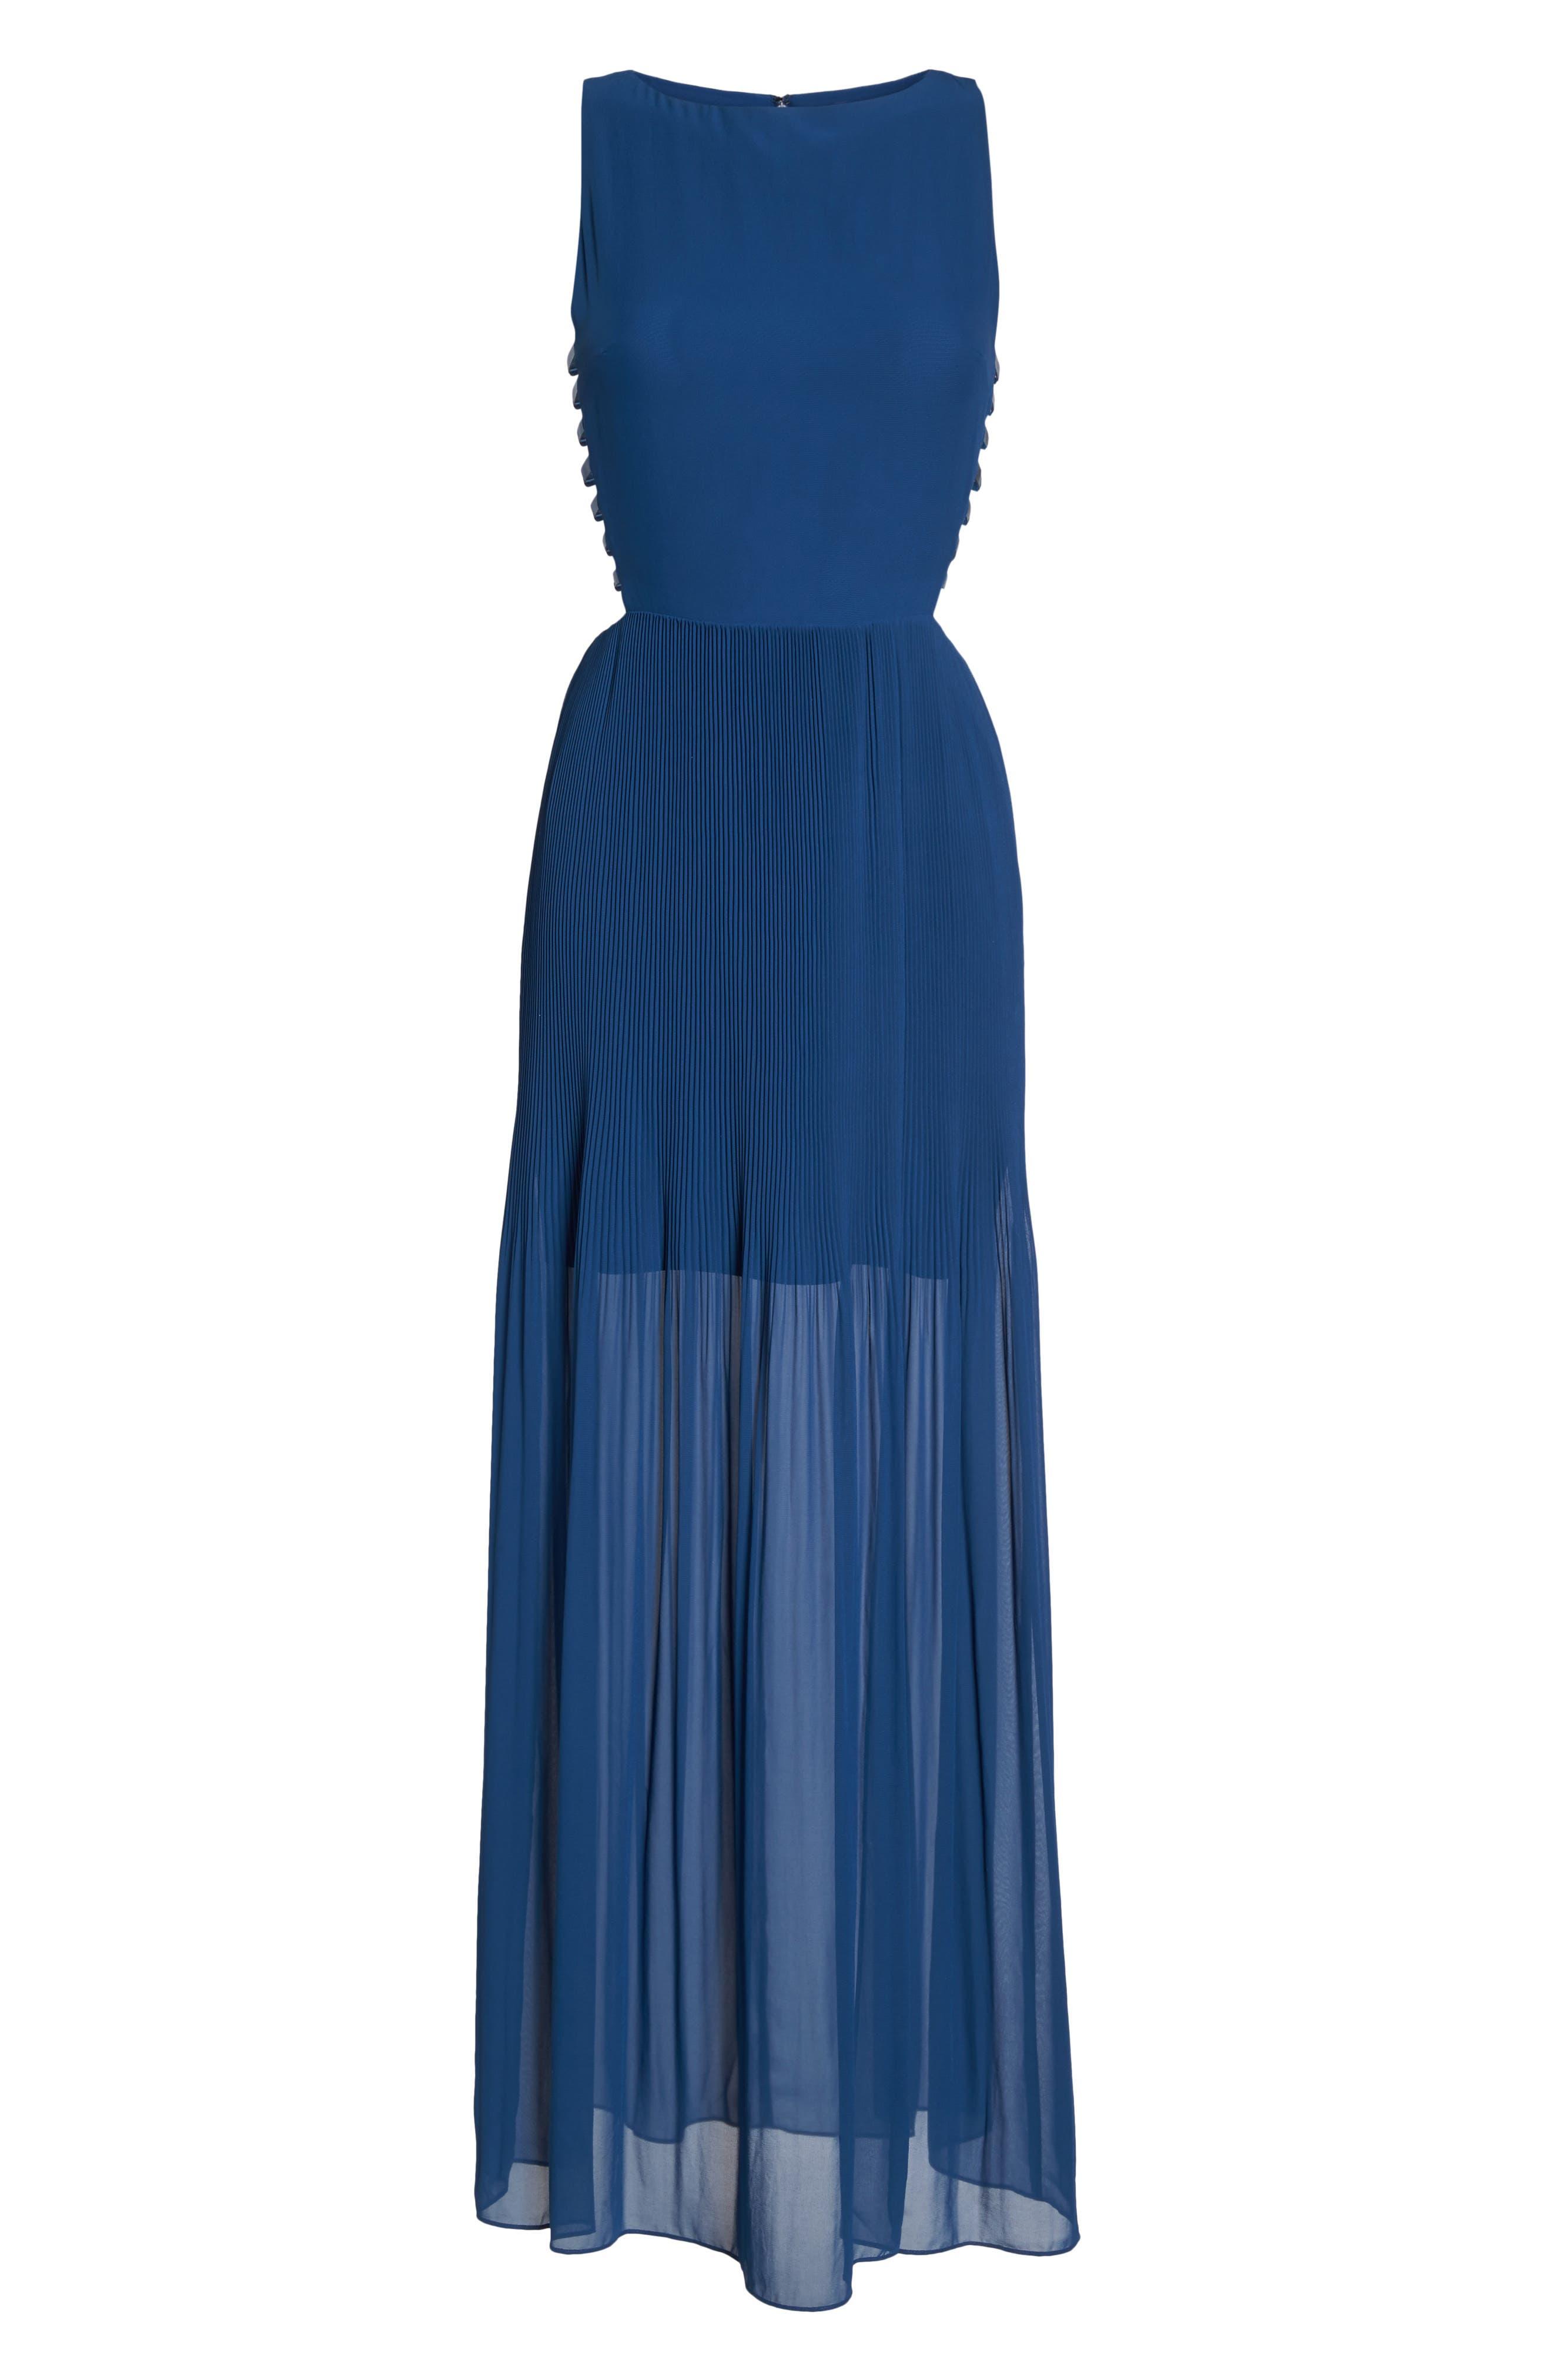 Sunset Blvd Maxi Dress,                             Alternate thumbnail 7, color,                             French Blue